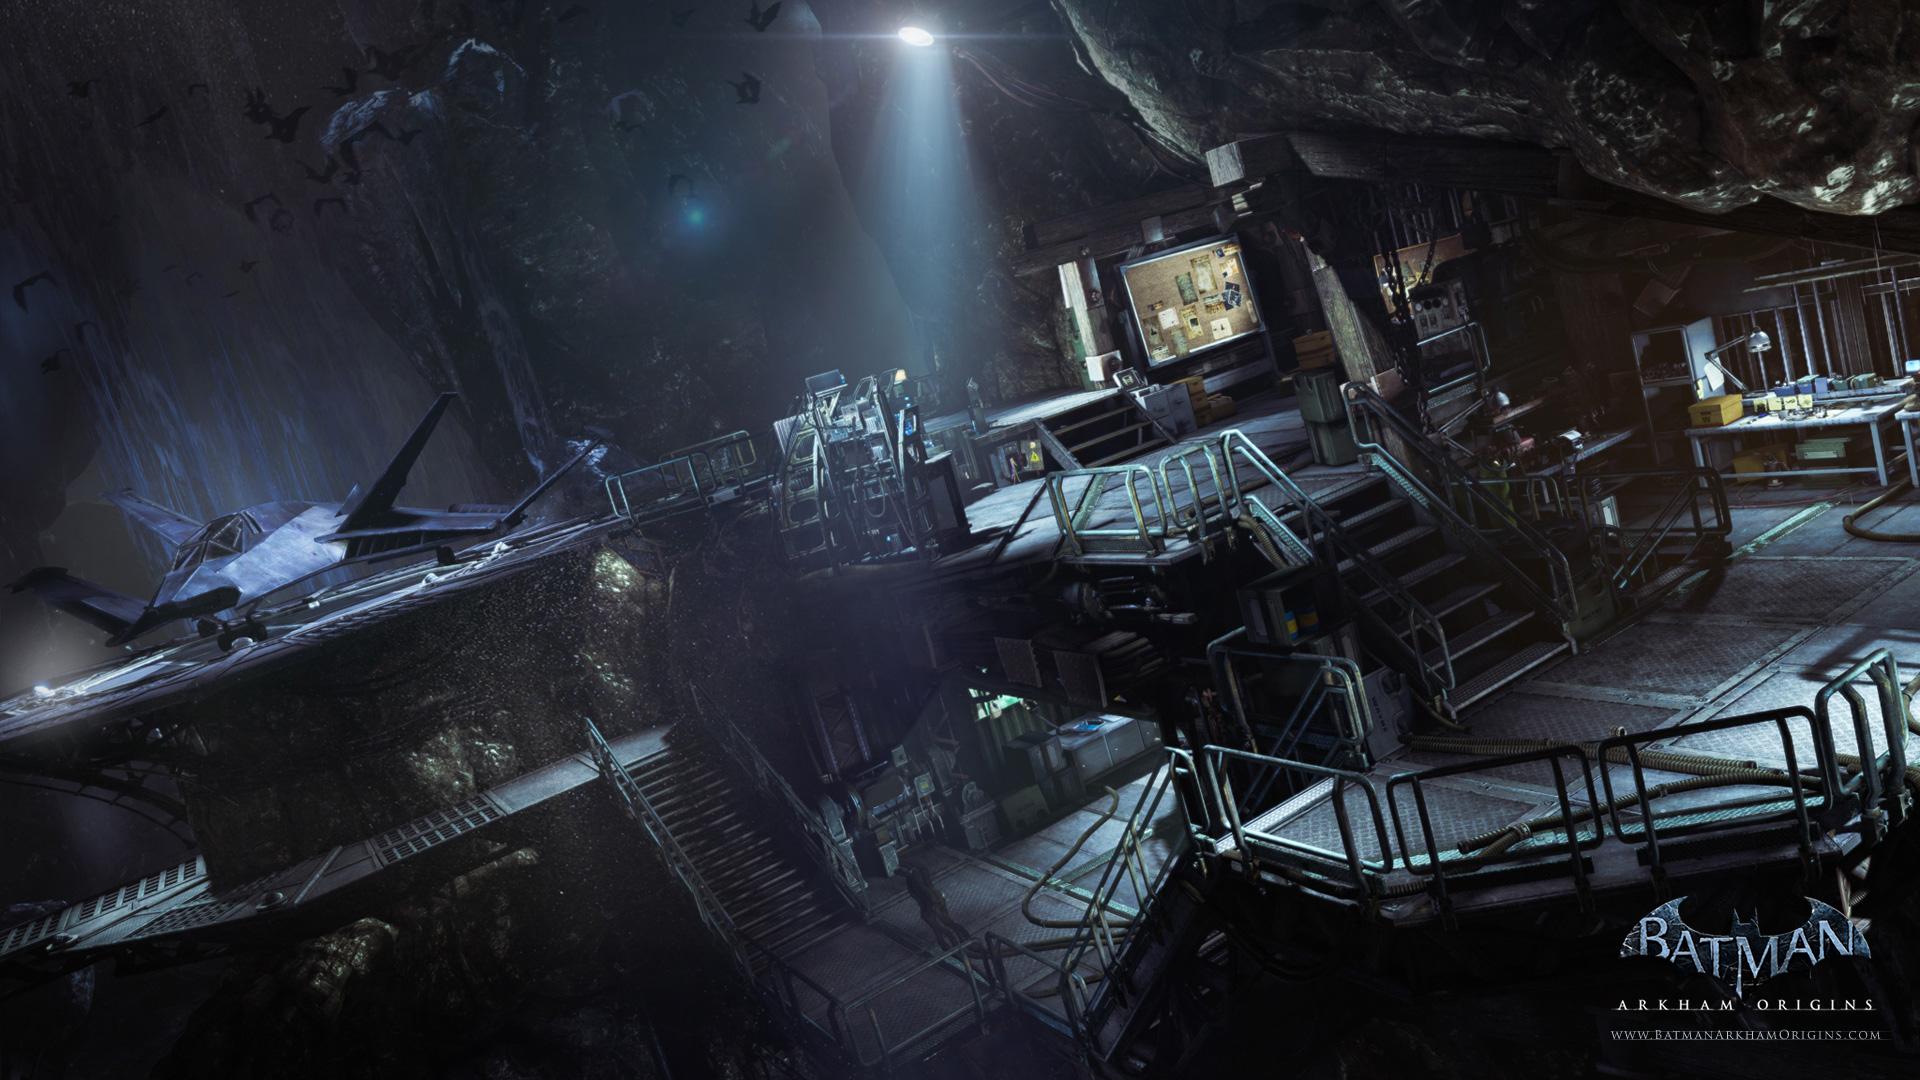 The Batcave as it appe...